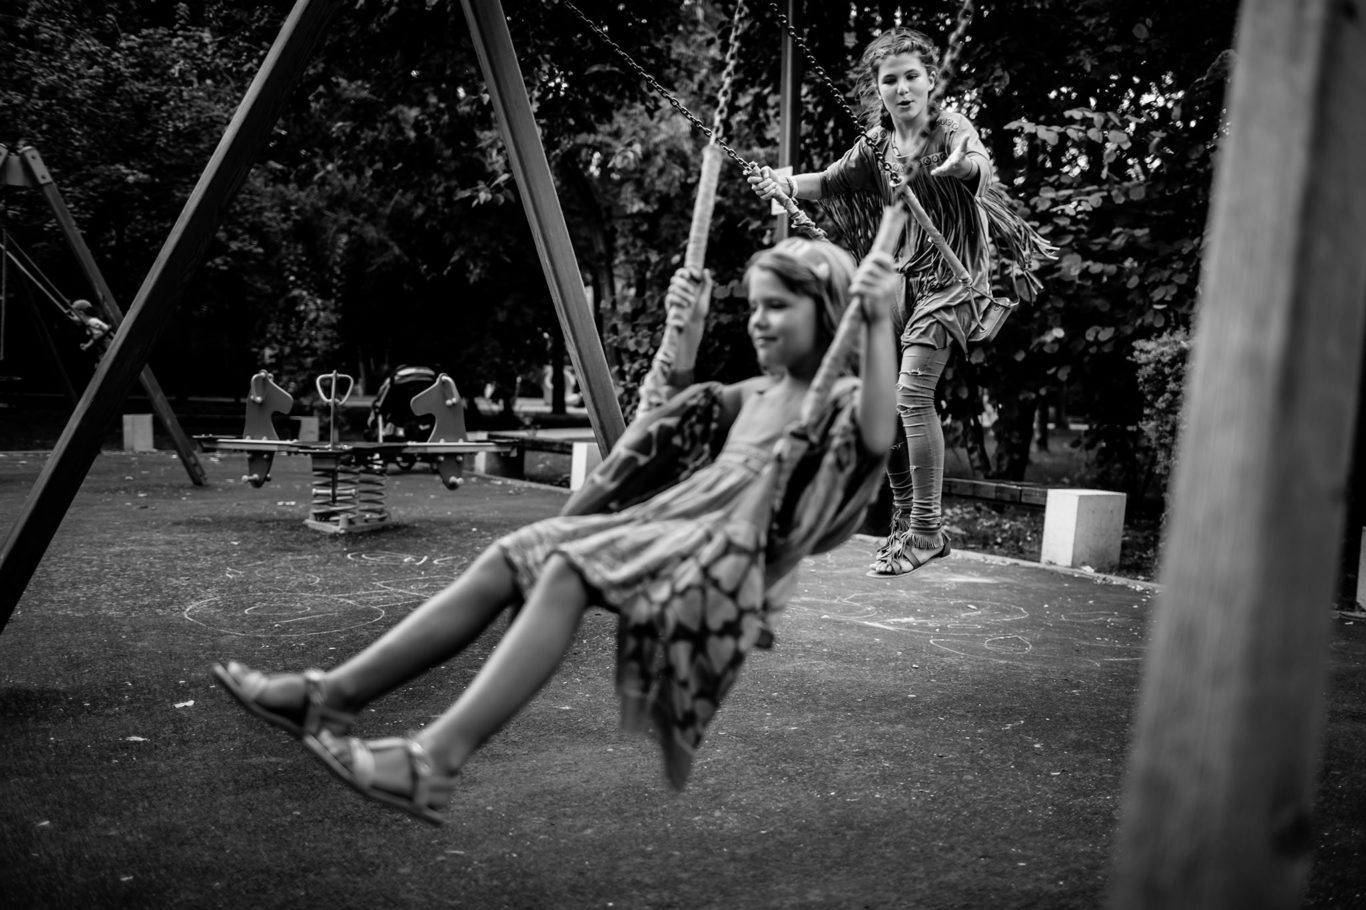 0023-fotografii-familie-ioana-alex-maia-roxi-fotograf-ciprian-dumitrescu-cd2_1604